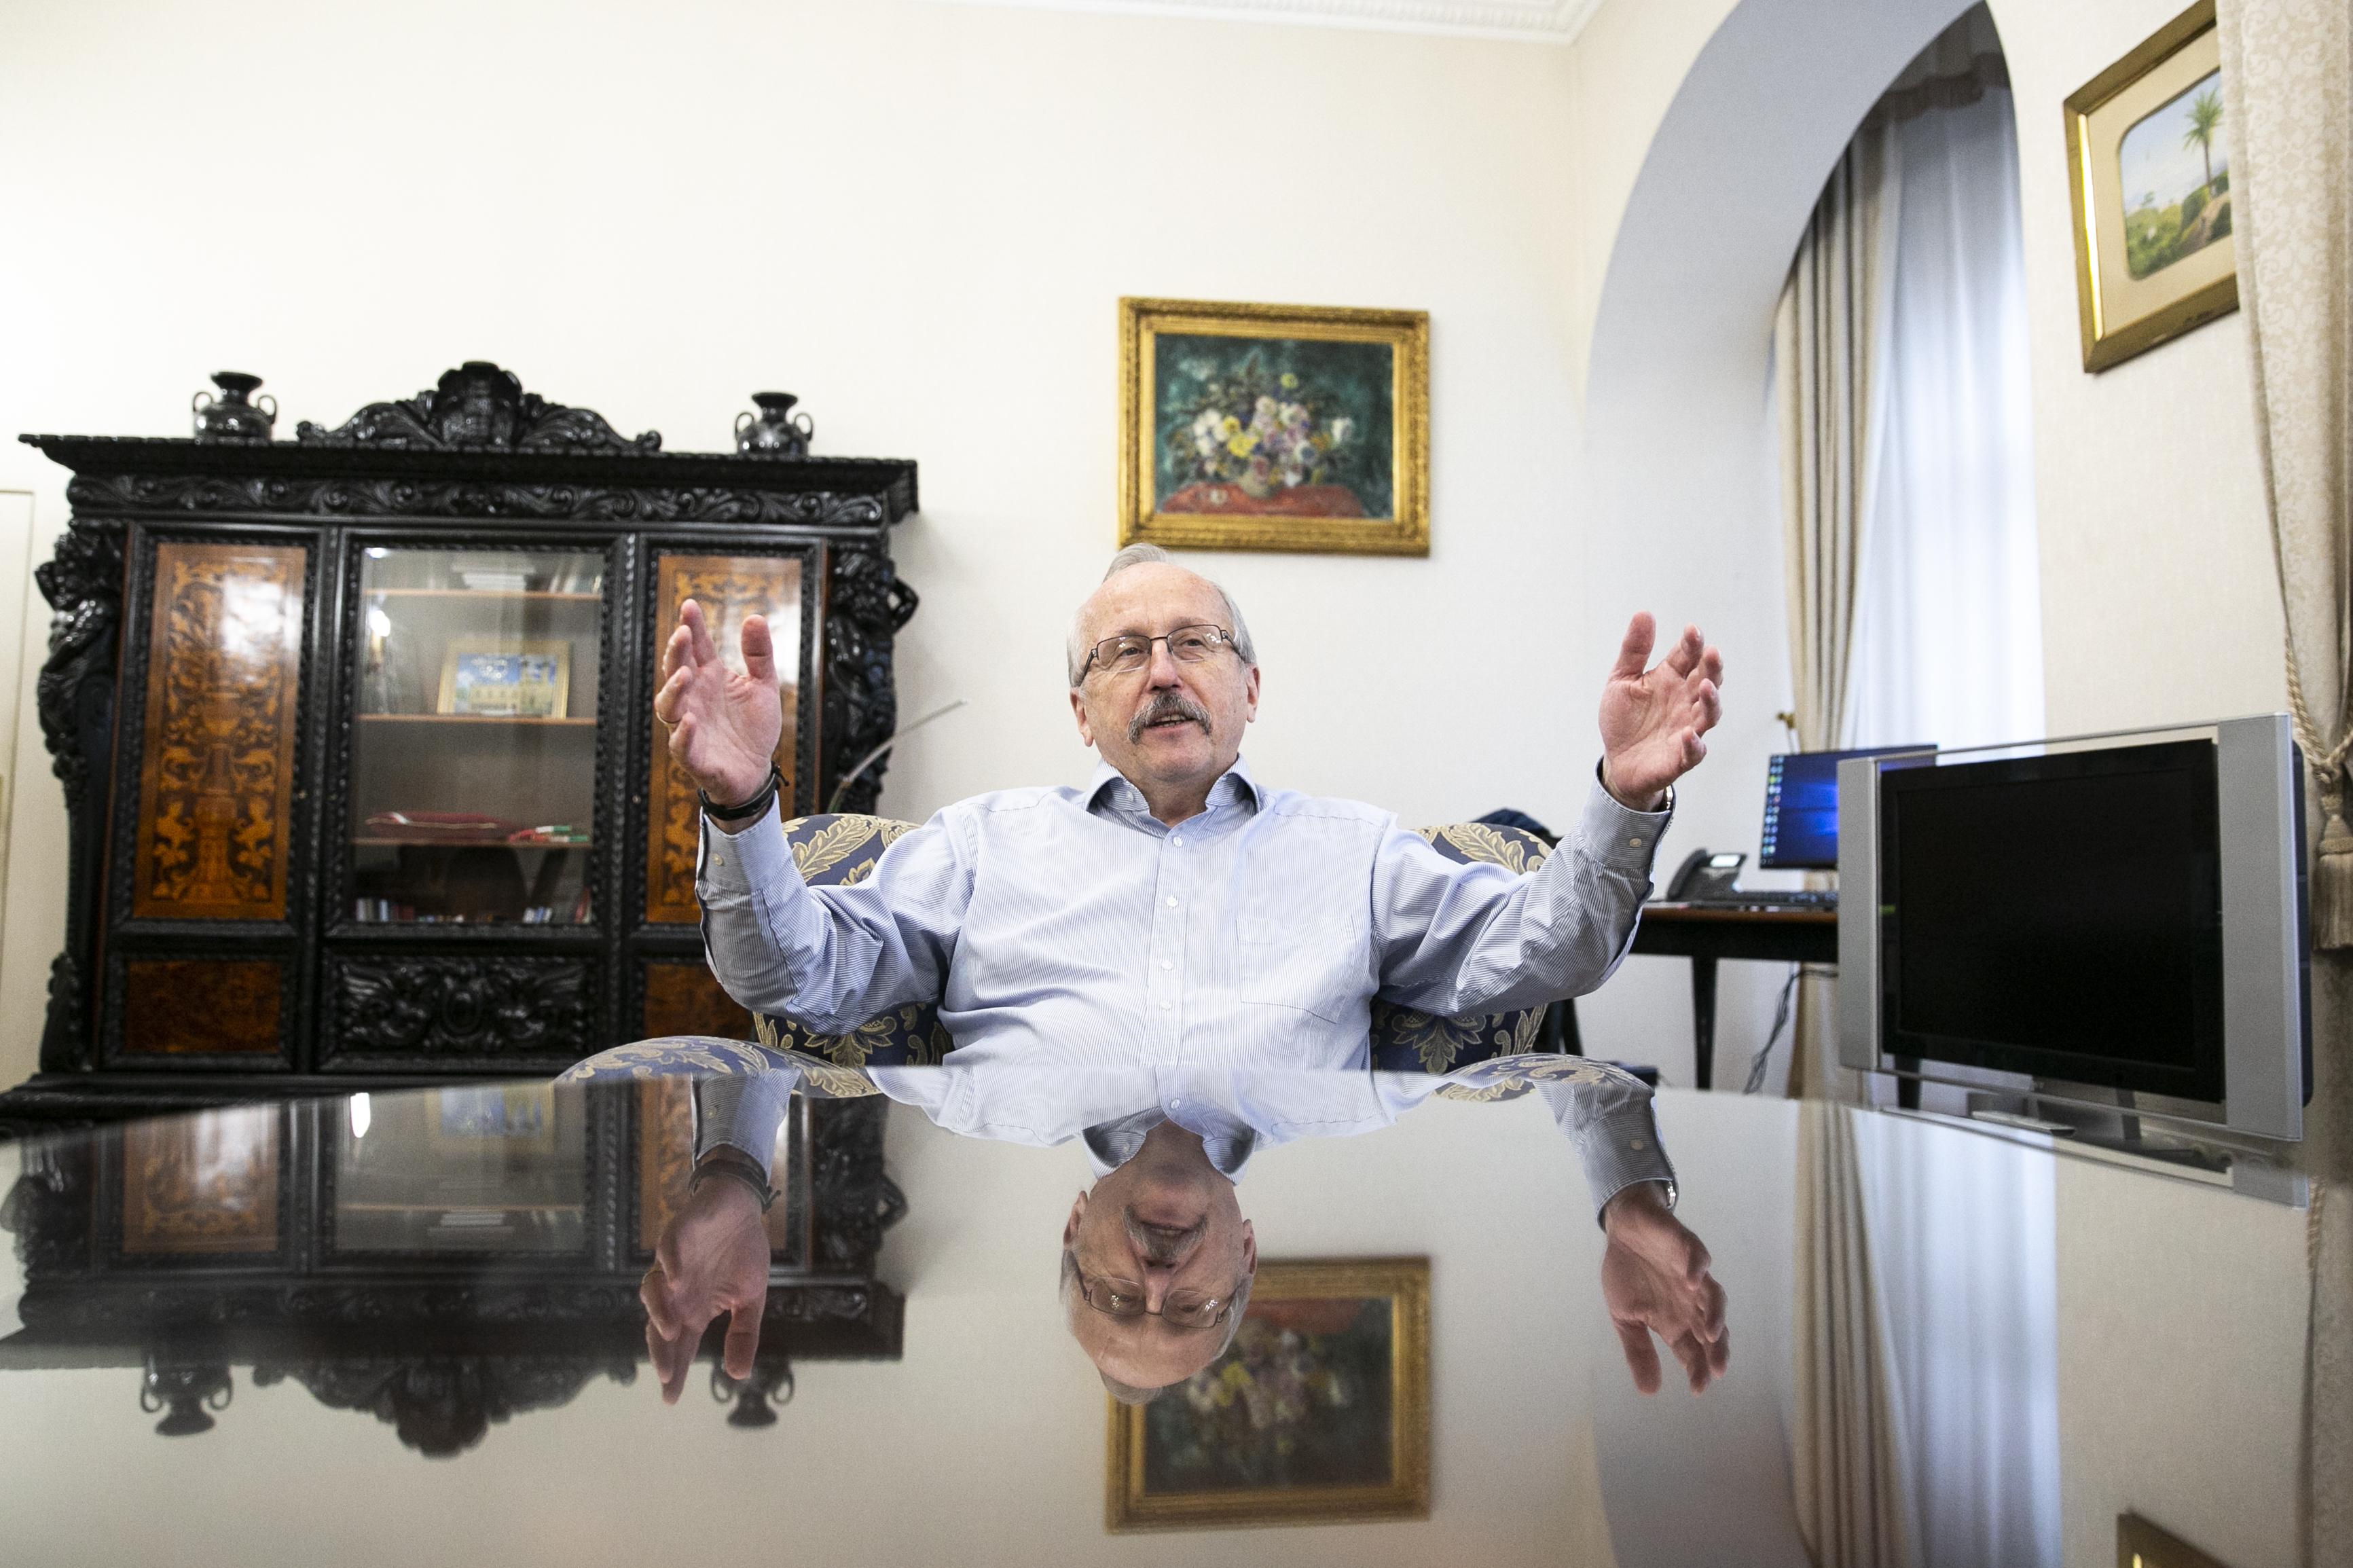 Niedermüller Péter szerint kedd este Budapesten jobb volt írnek lenni